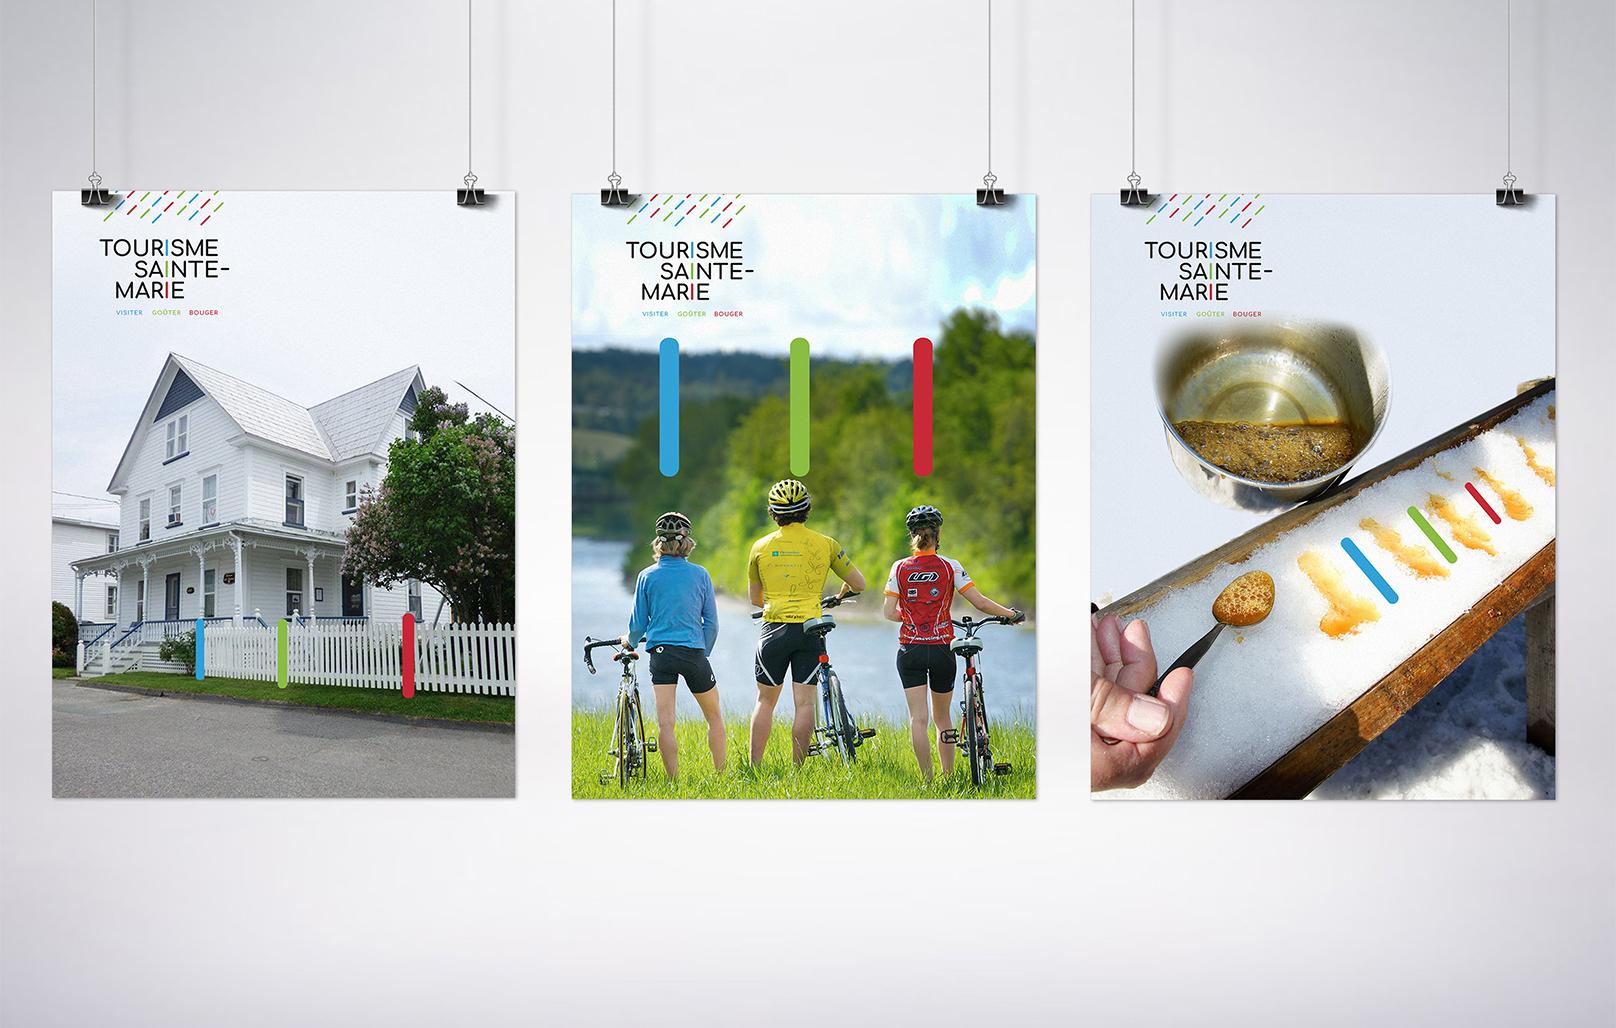 tourisme-sainte-marie-affiches